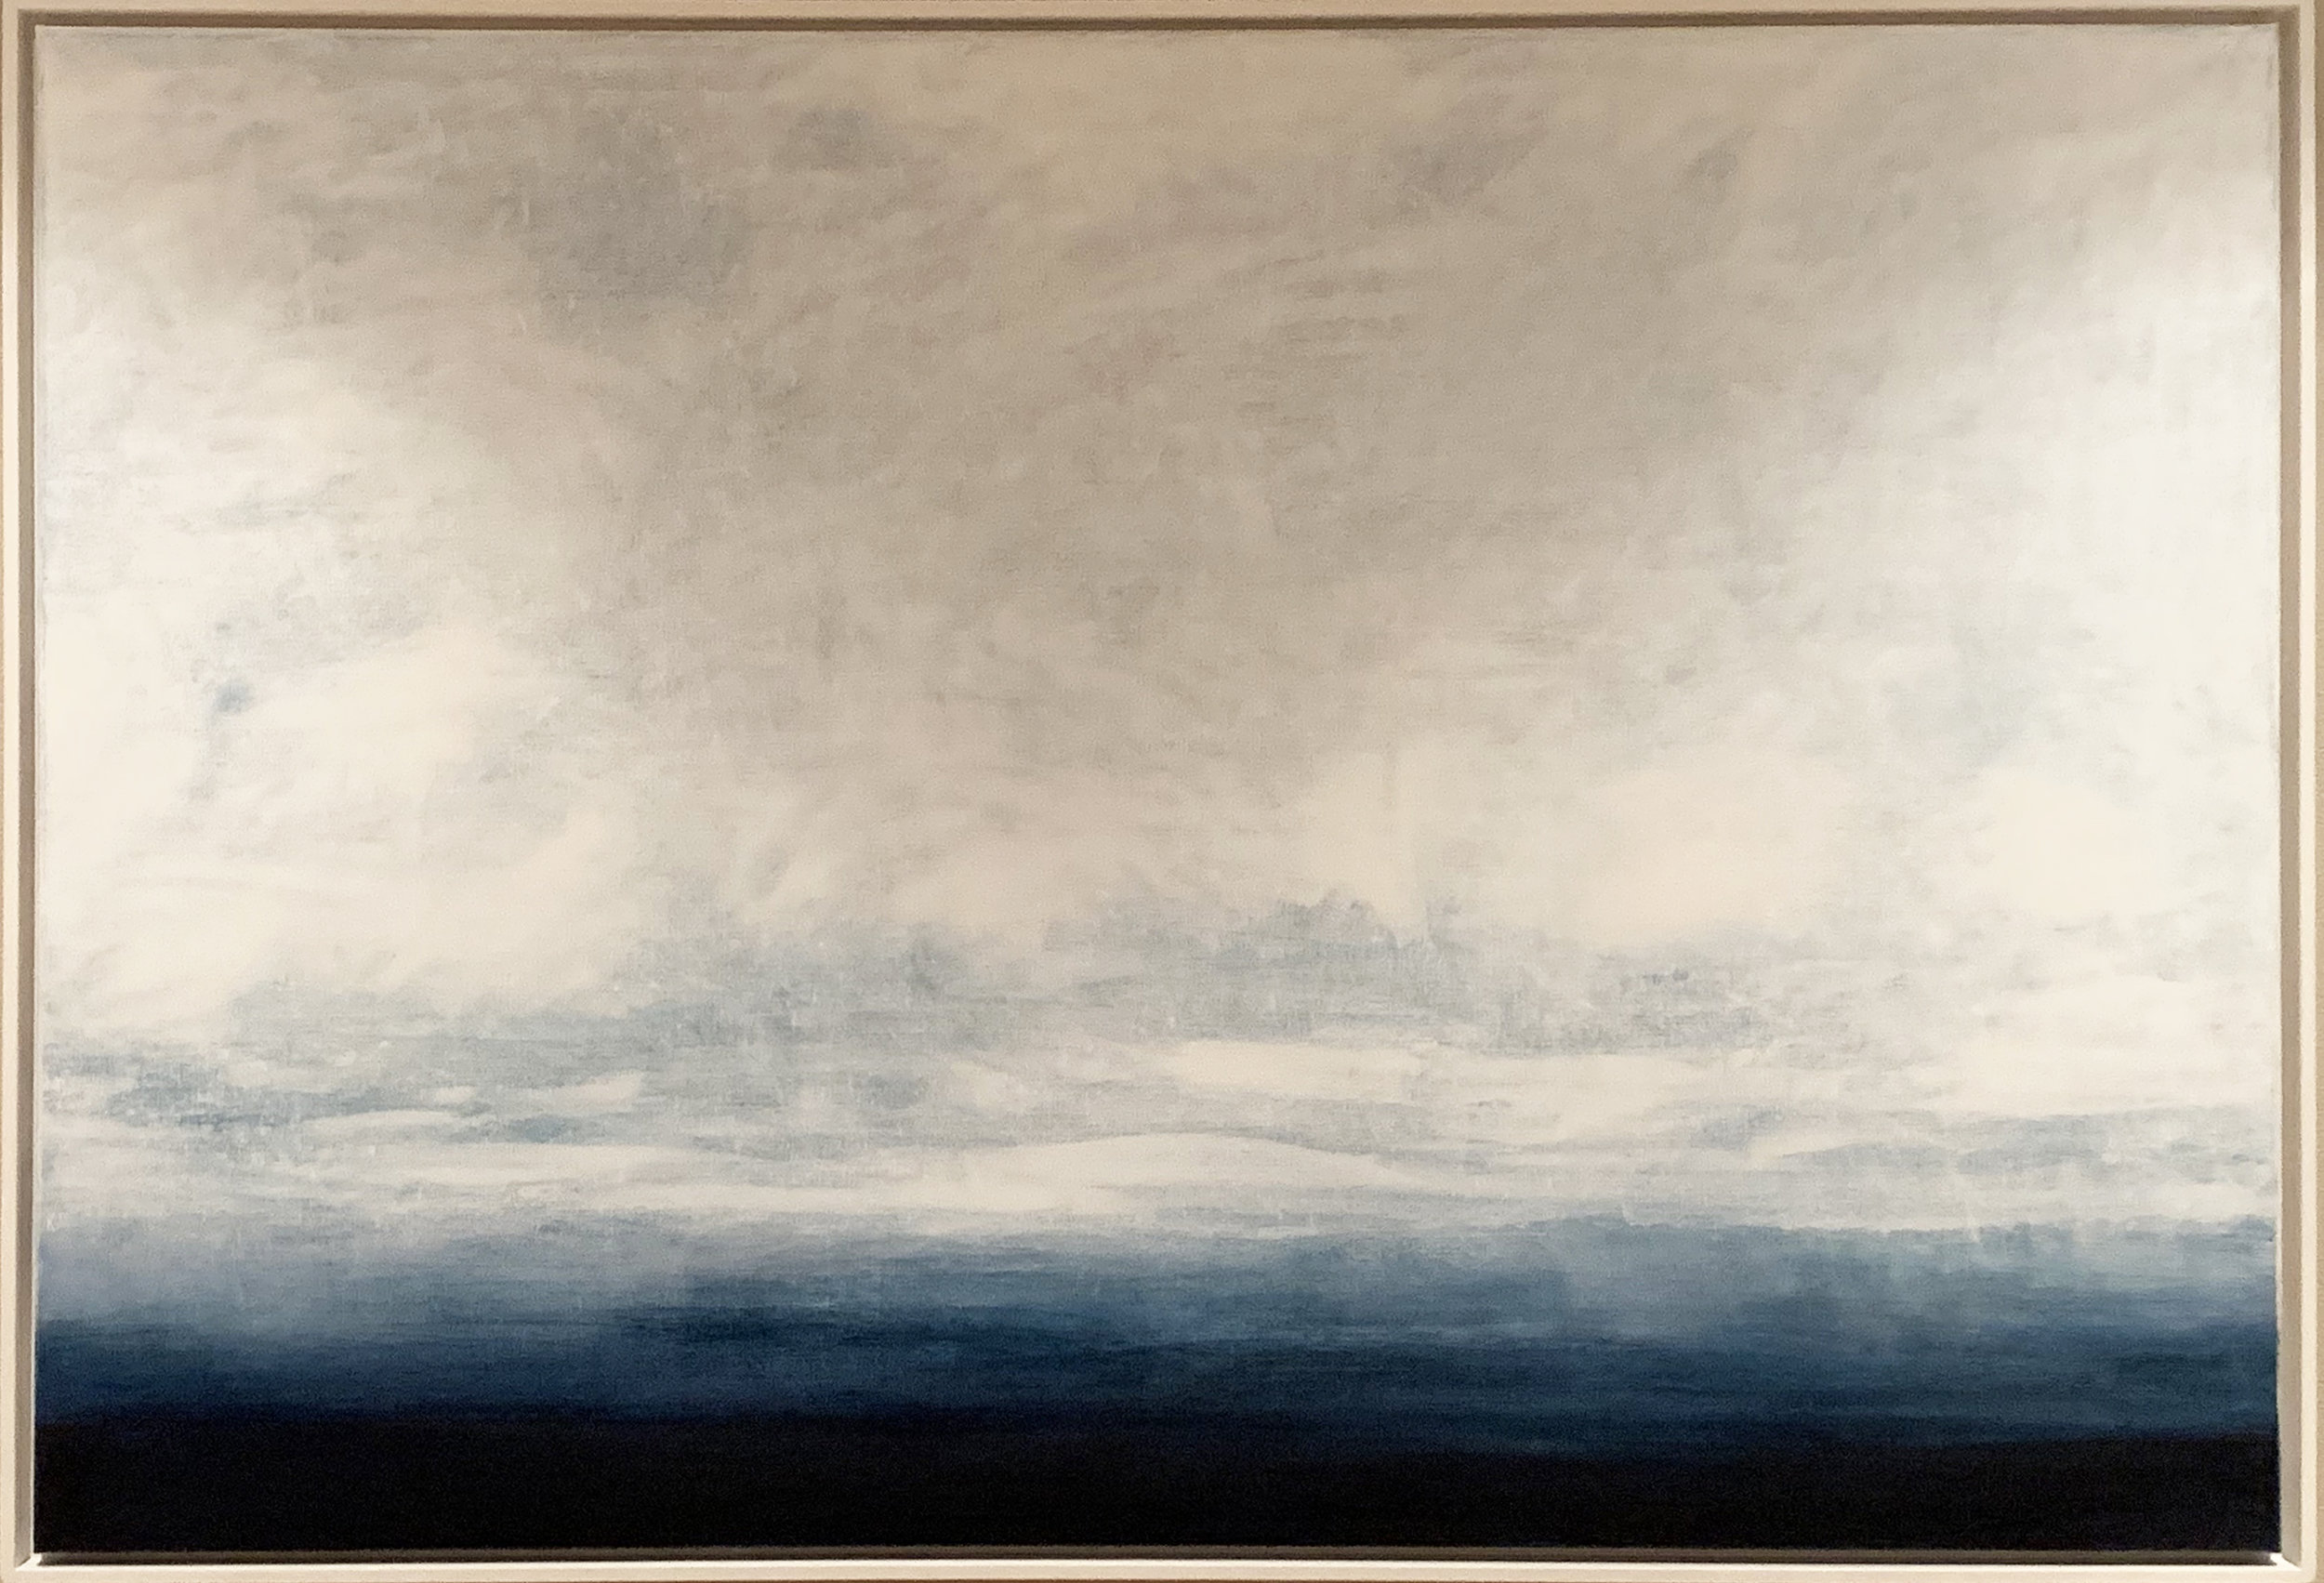 MIST oils on canvas. 154cm x 104cm SOLD 🔴